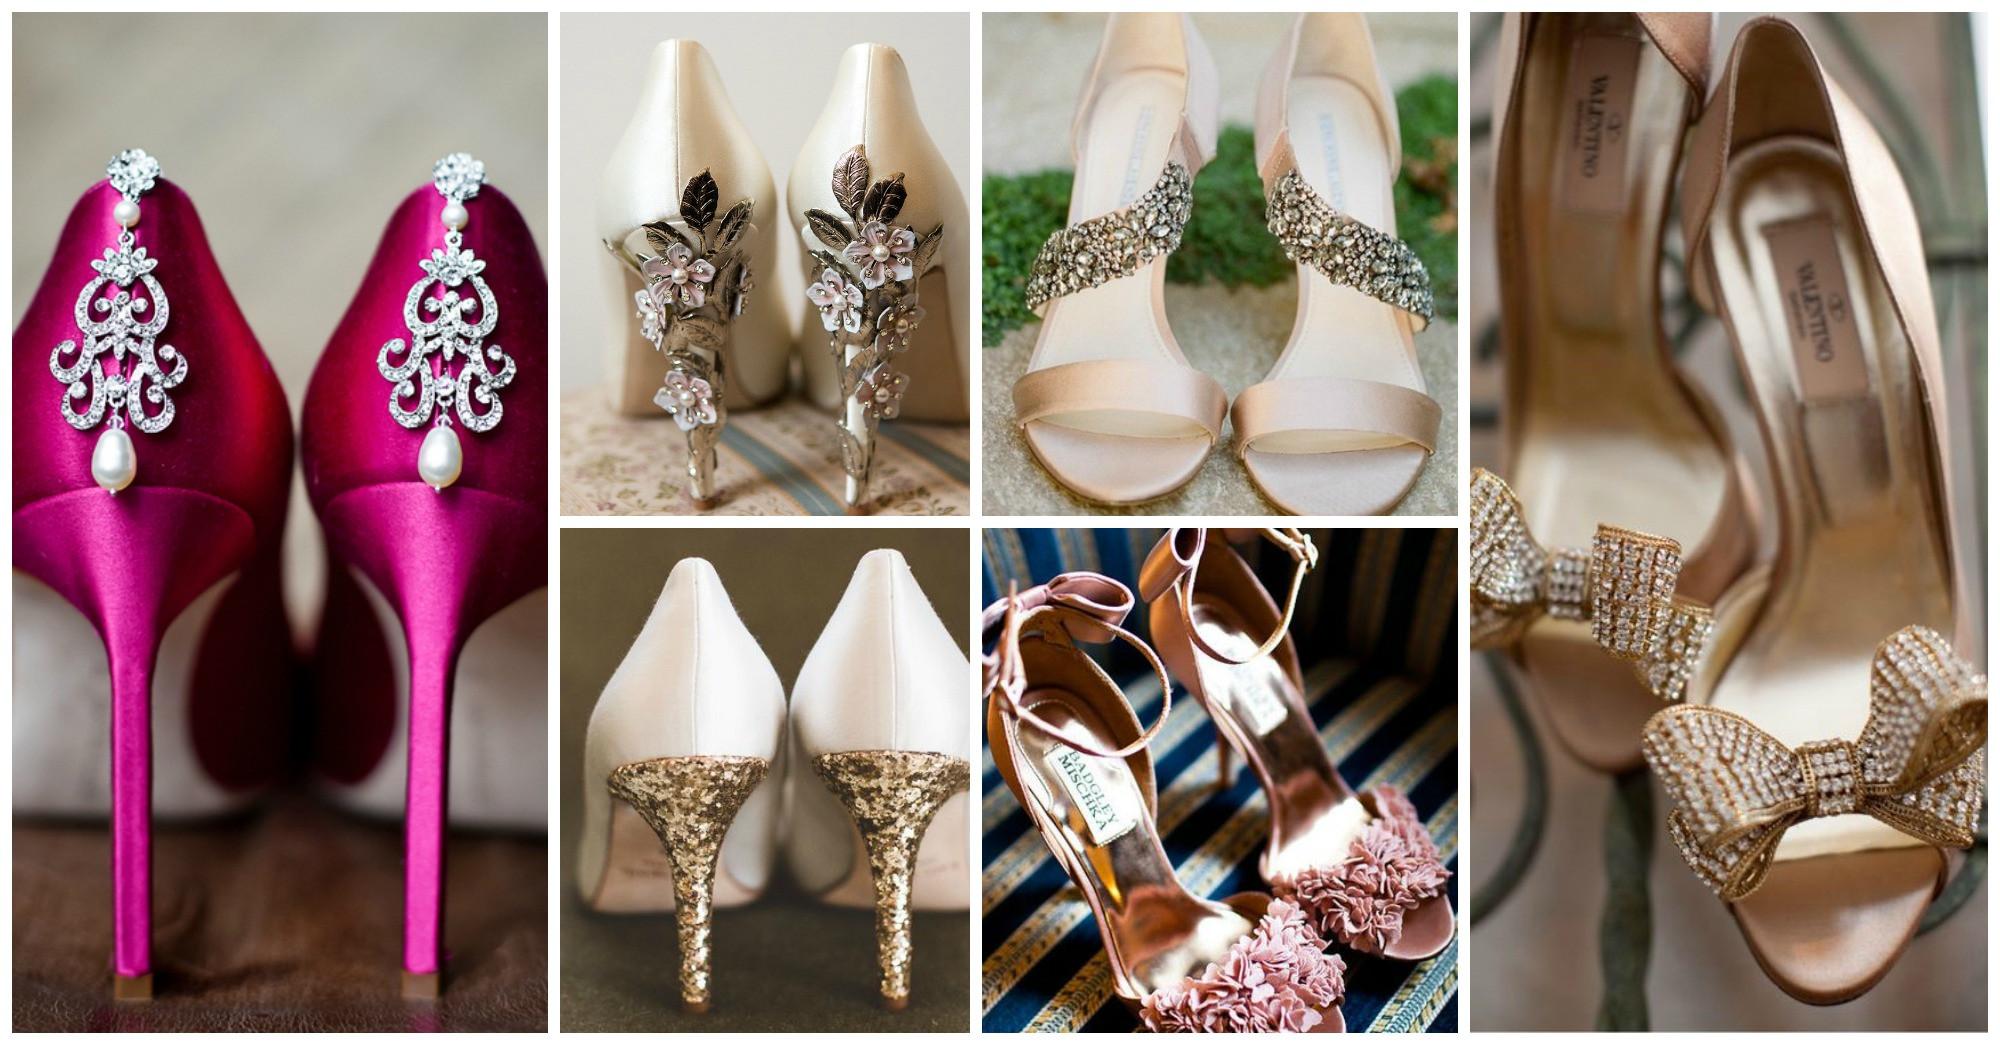 DIY Wedding Shoe  10 Fabulous DIY Wedding Shoes Every Bride Should See